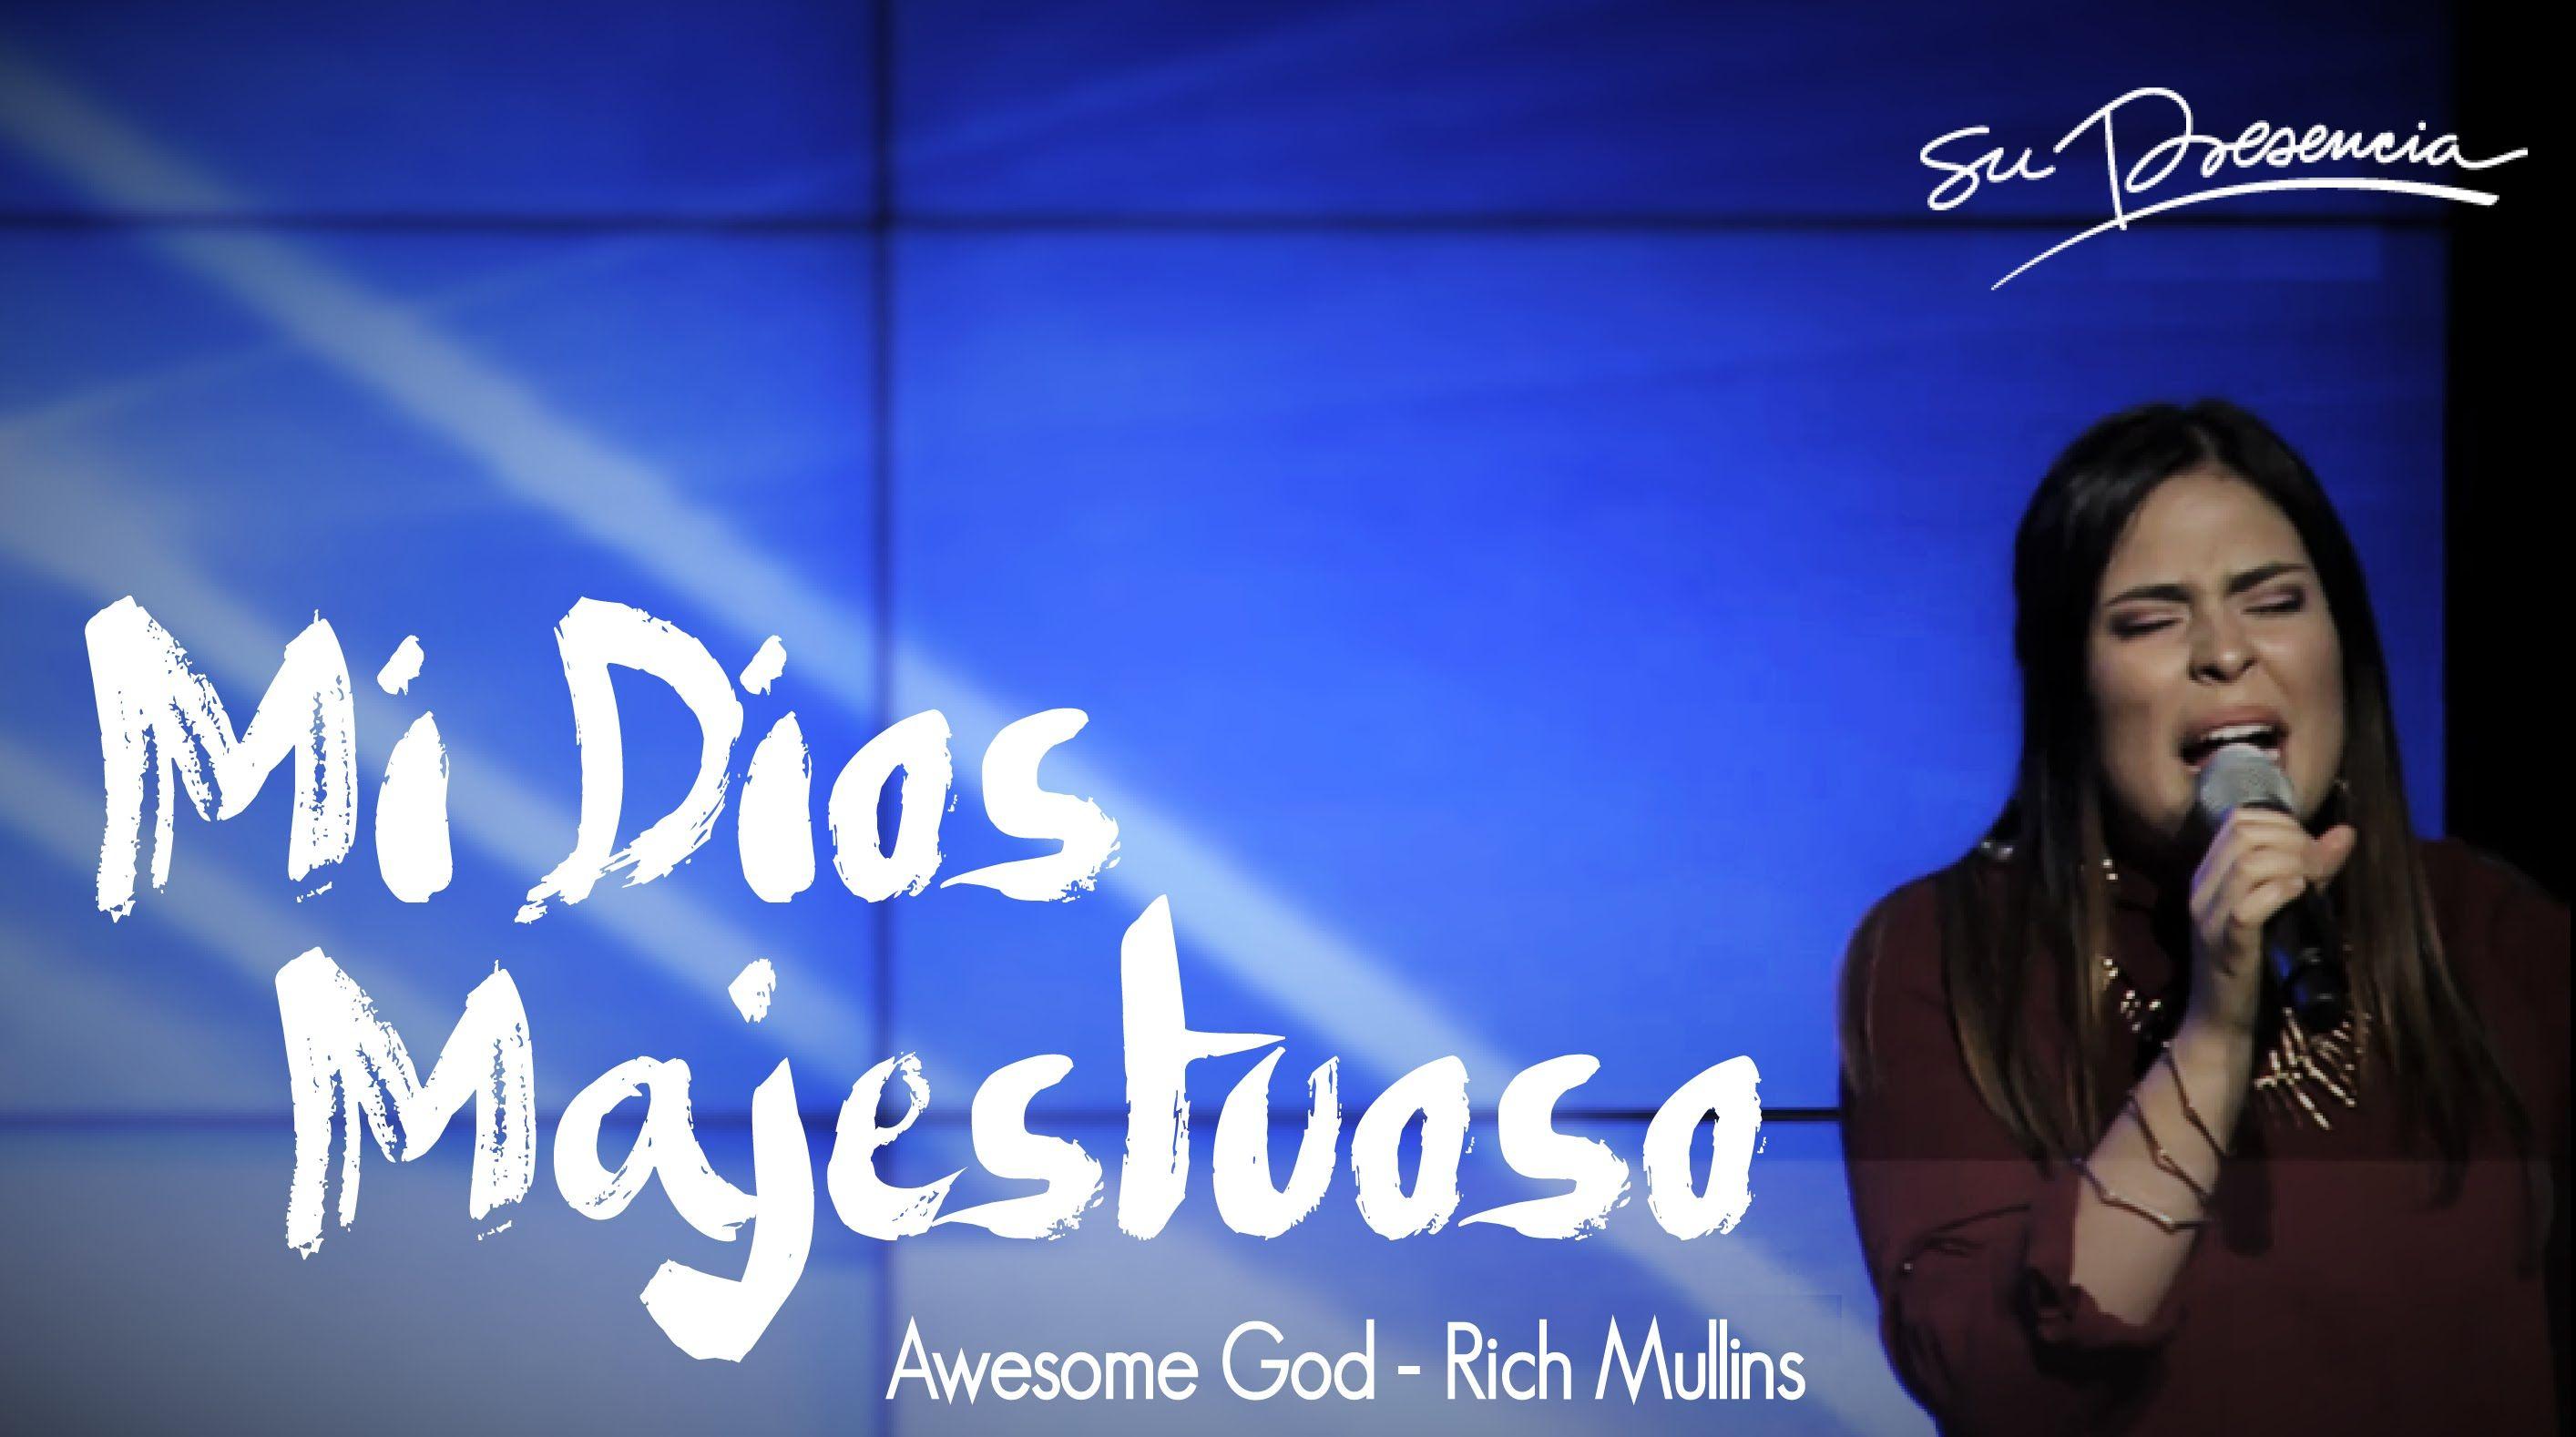 Mi Dios Majestuoso Su Presencia Awesome God Rich Mullins